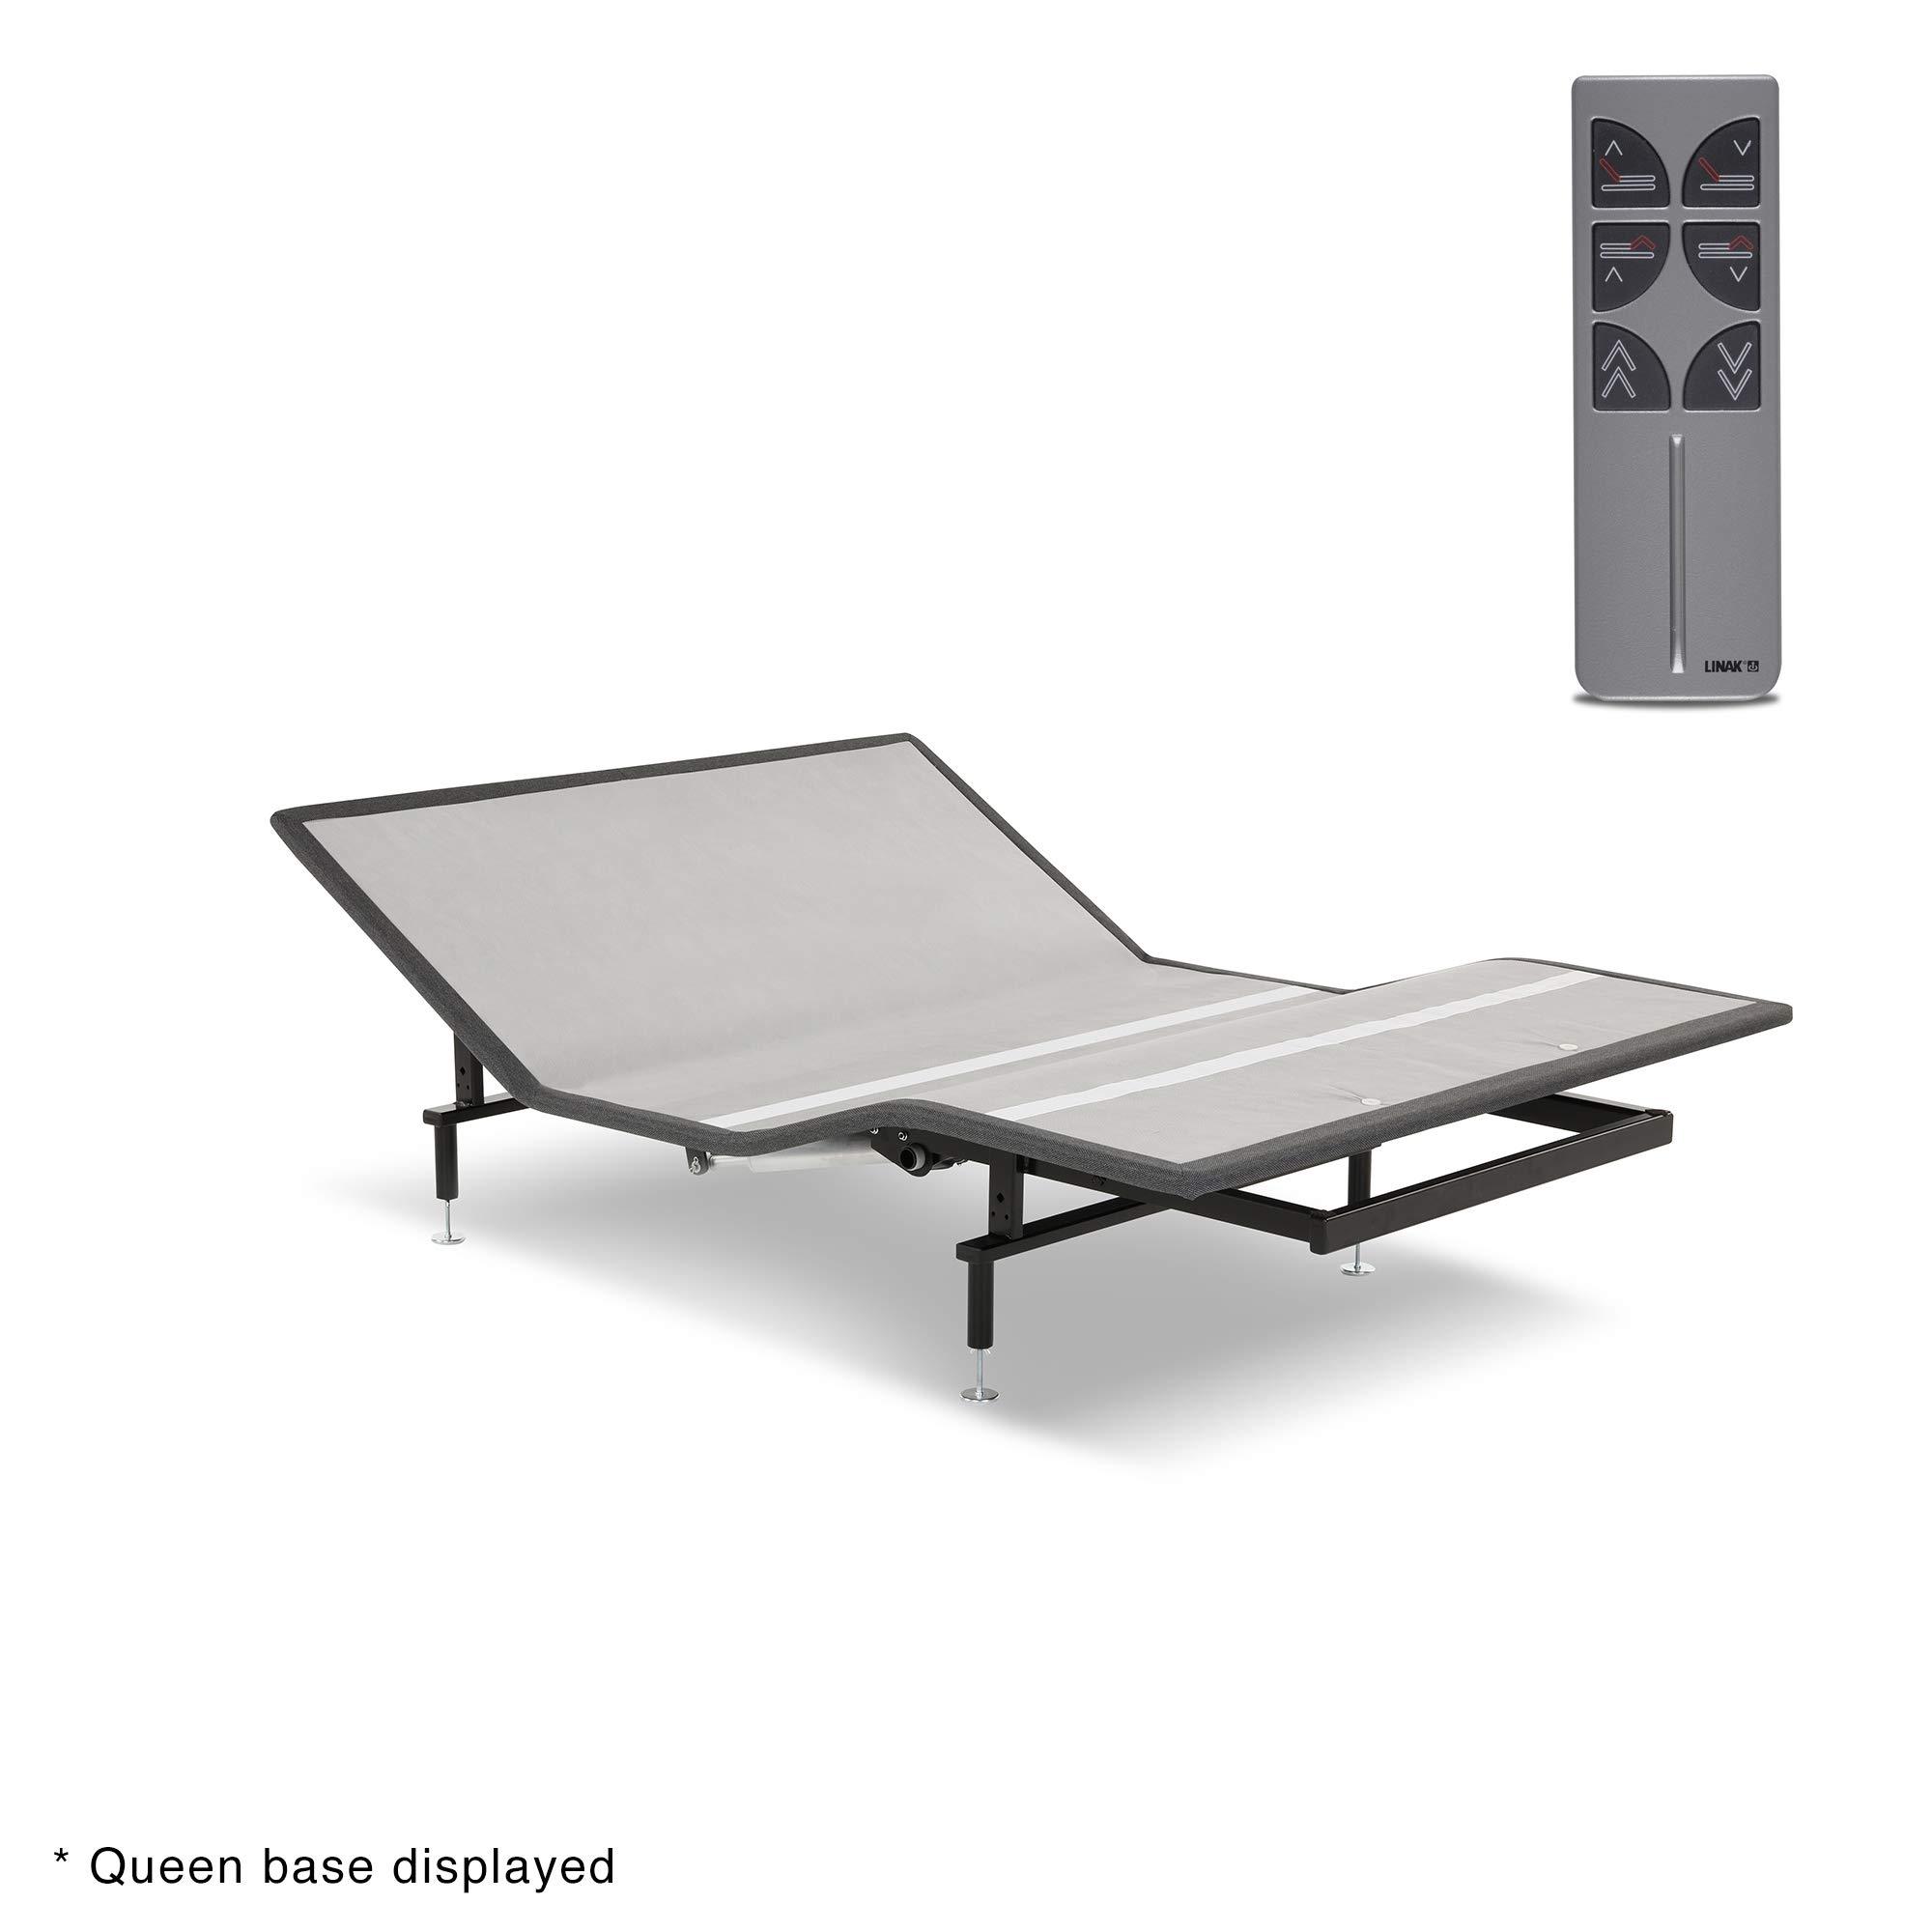 Leggett & Platt Sunrise Slim-Profile Adjustable Bed Base for Platform Beds with Wireless Remote, Charcoal Gray, Twin XL